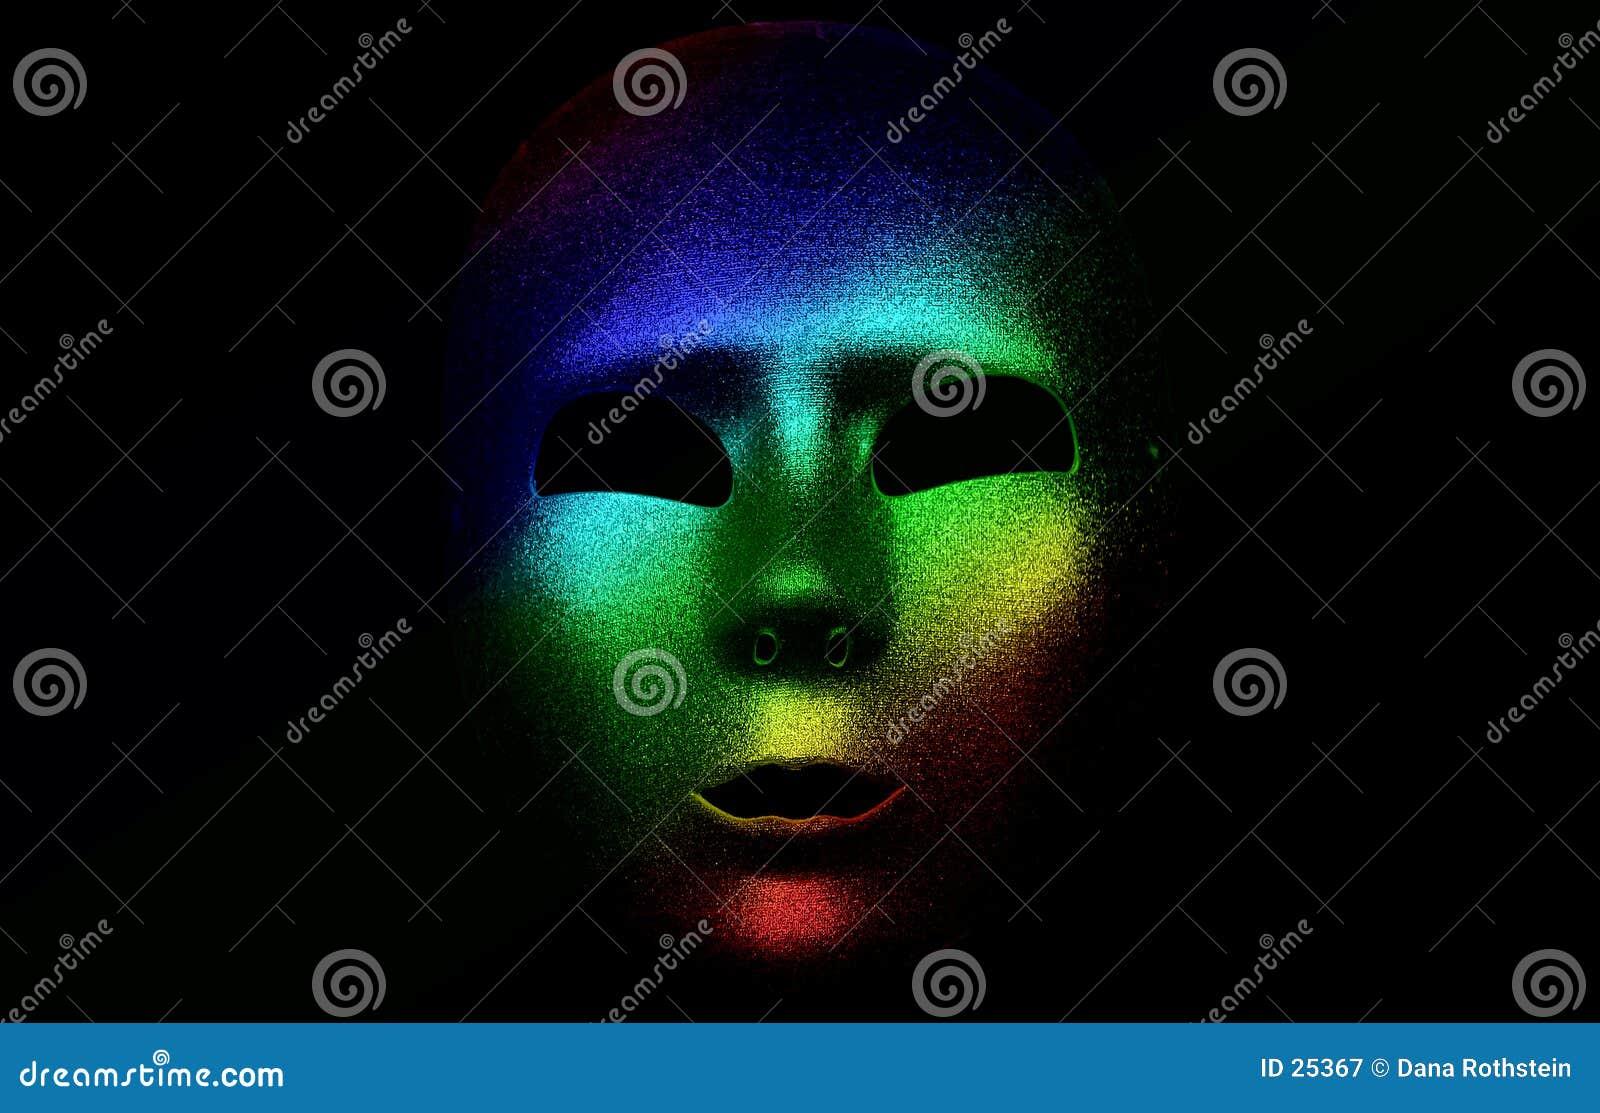 Colorized Mask